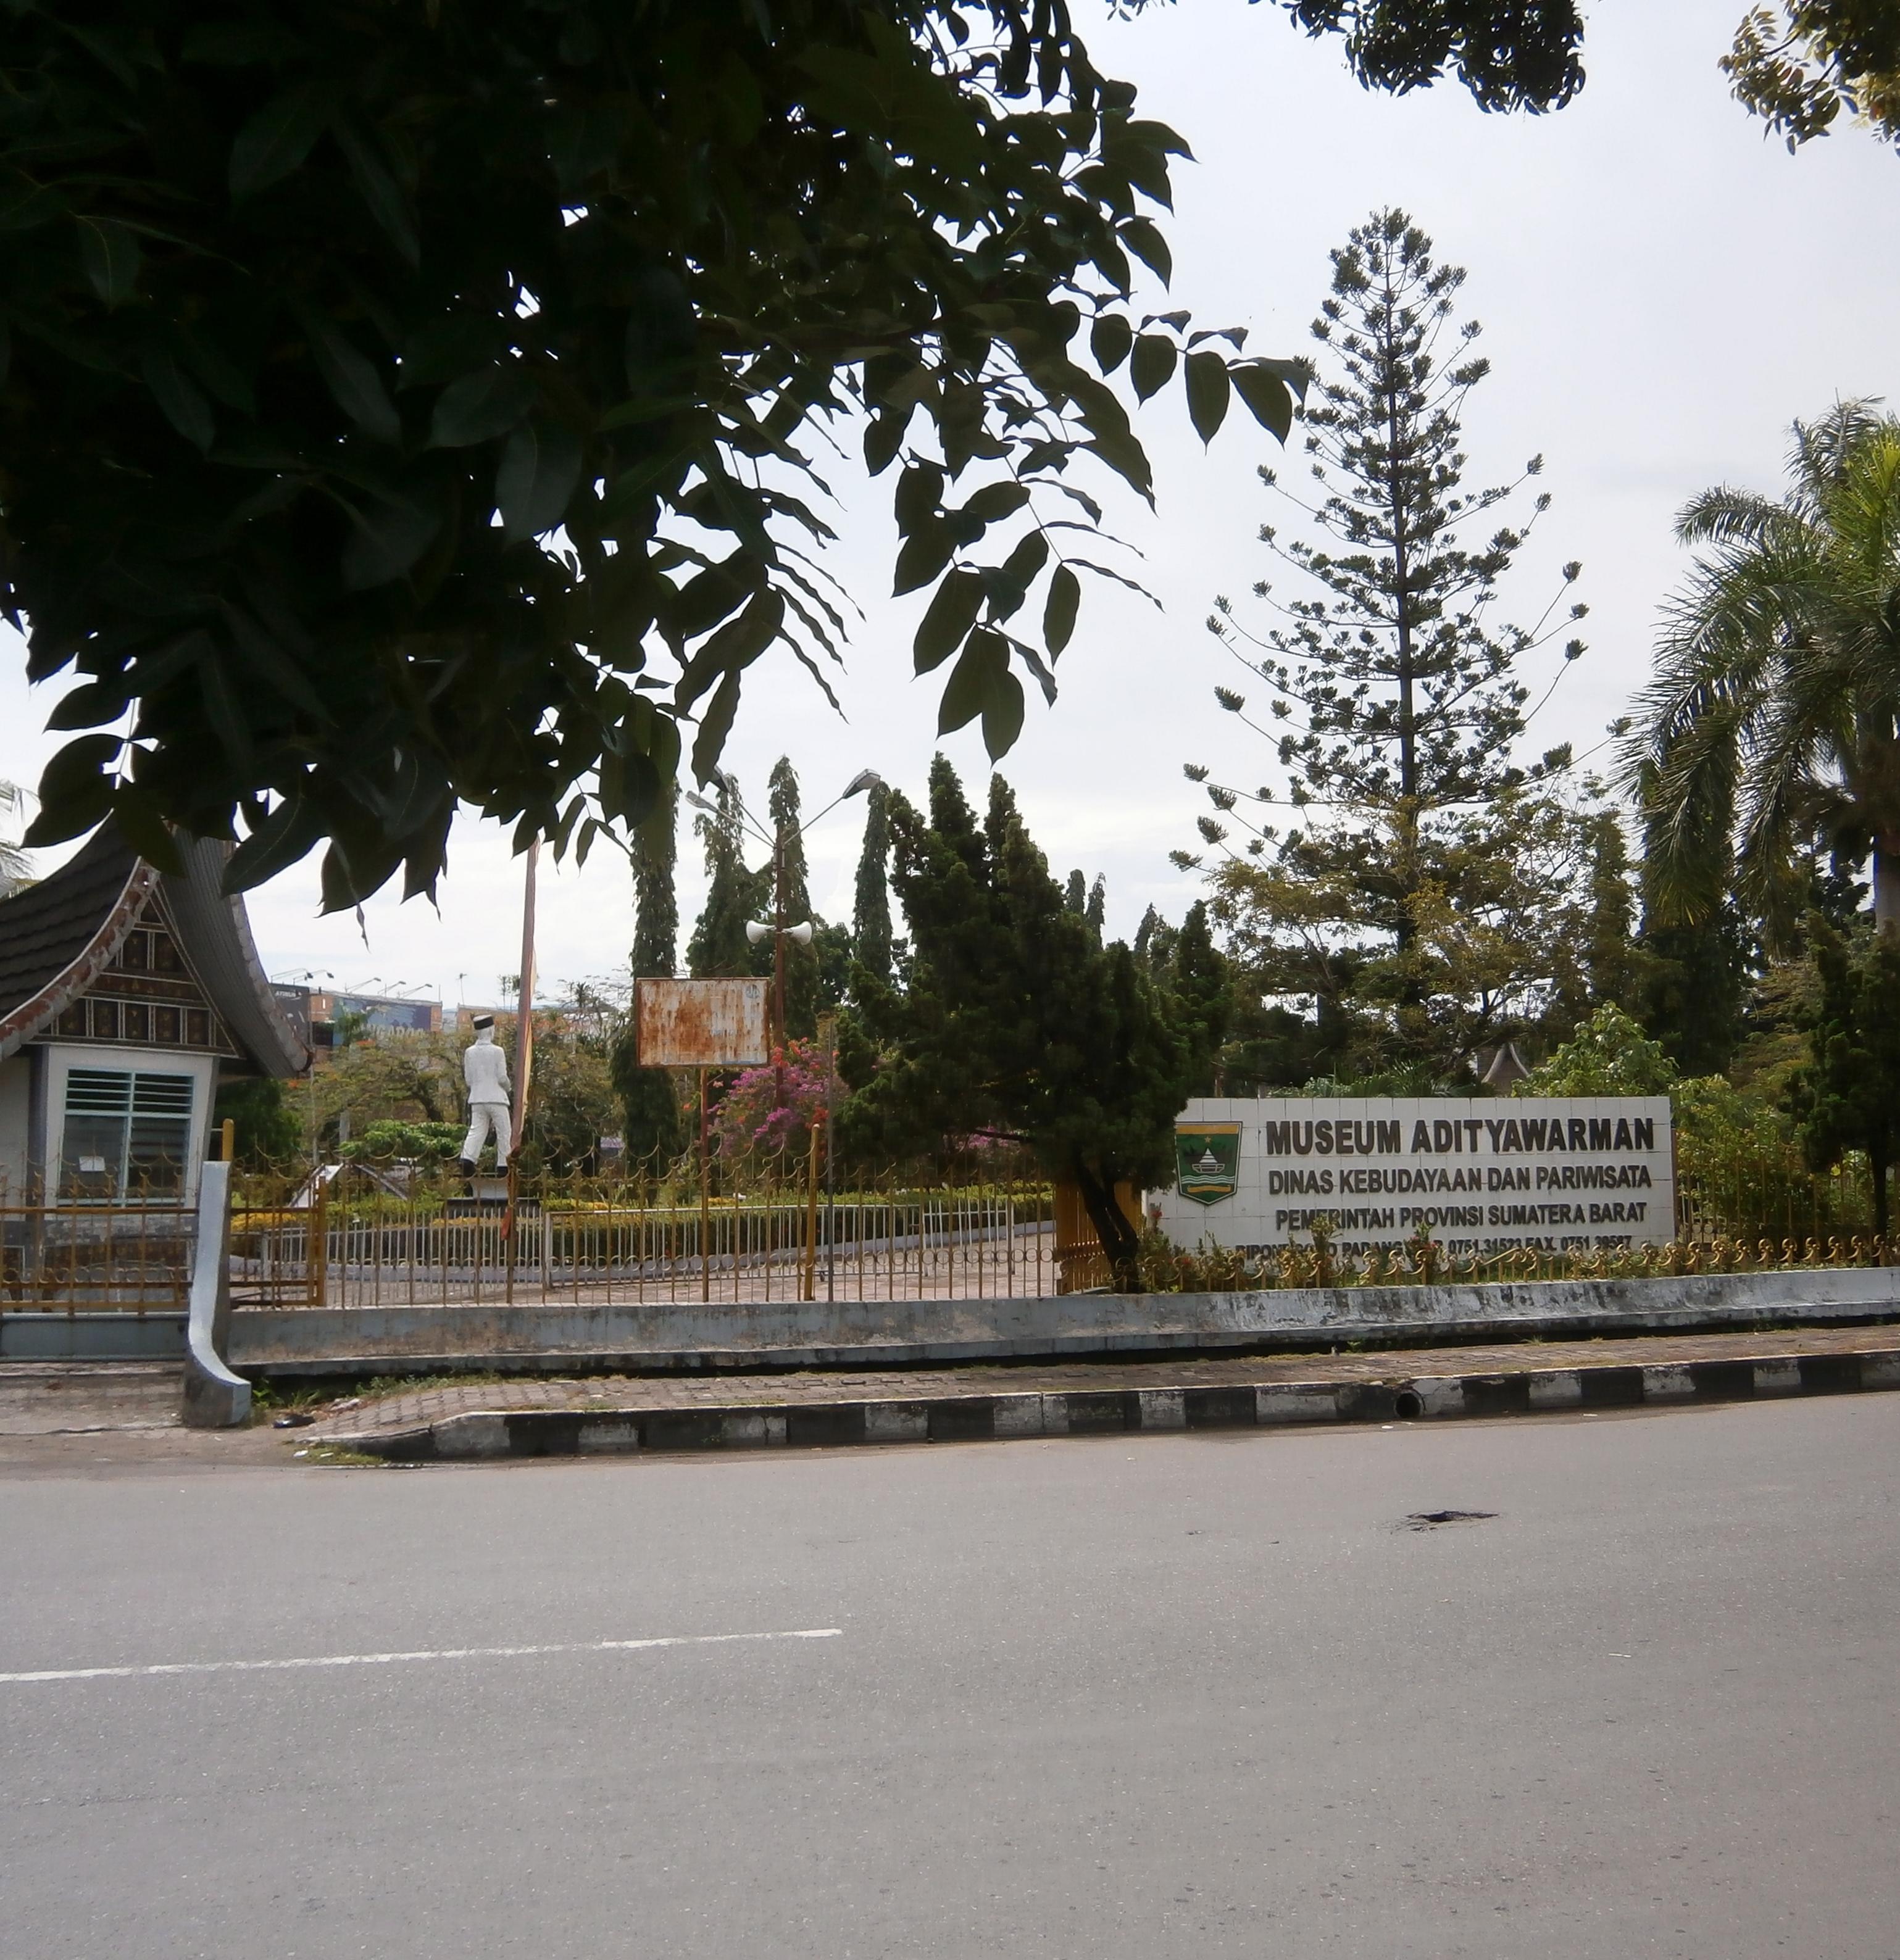 Bundaran Taman Melati Jl Diponegoro Night Shot Mapio Net Musium